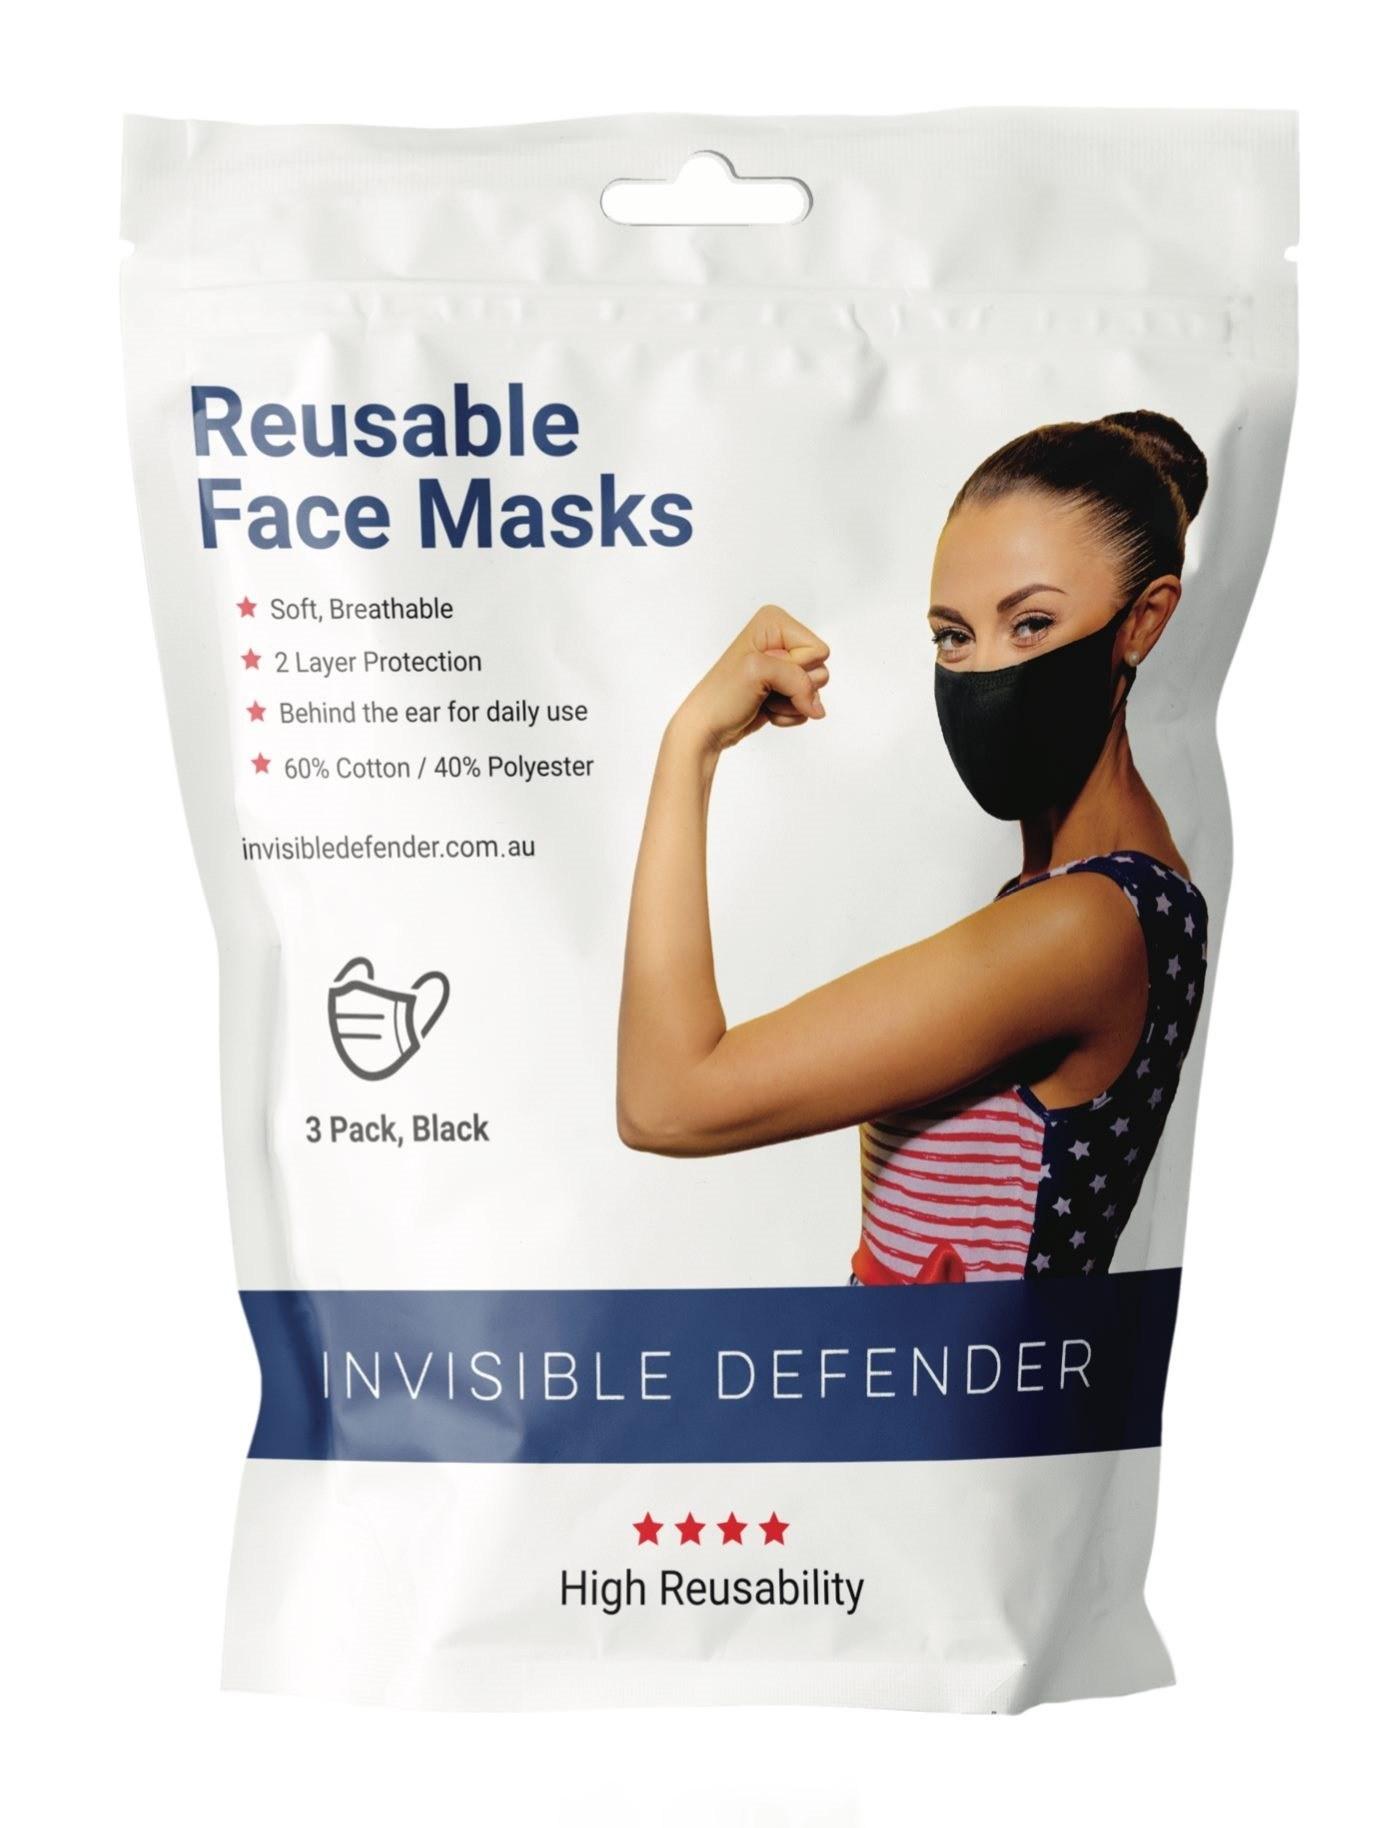 Reusable 2 Ply Fabric Face Masks